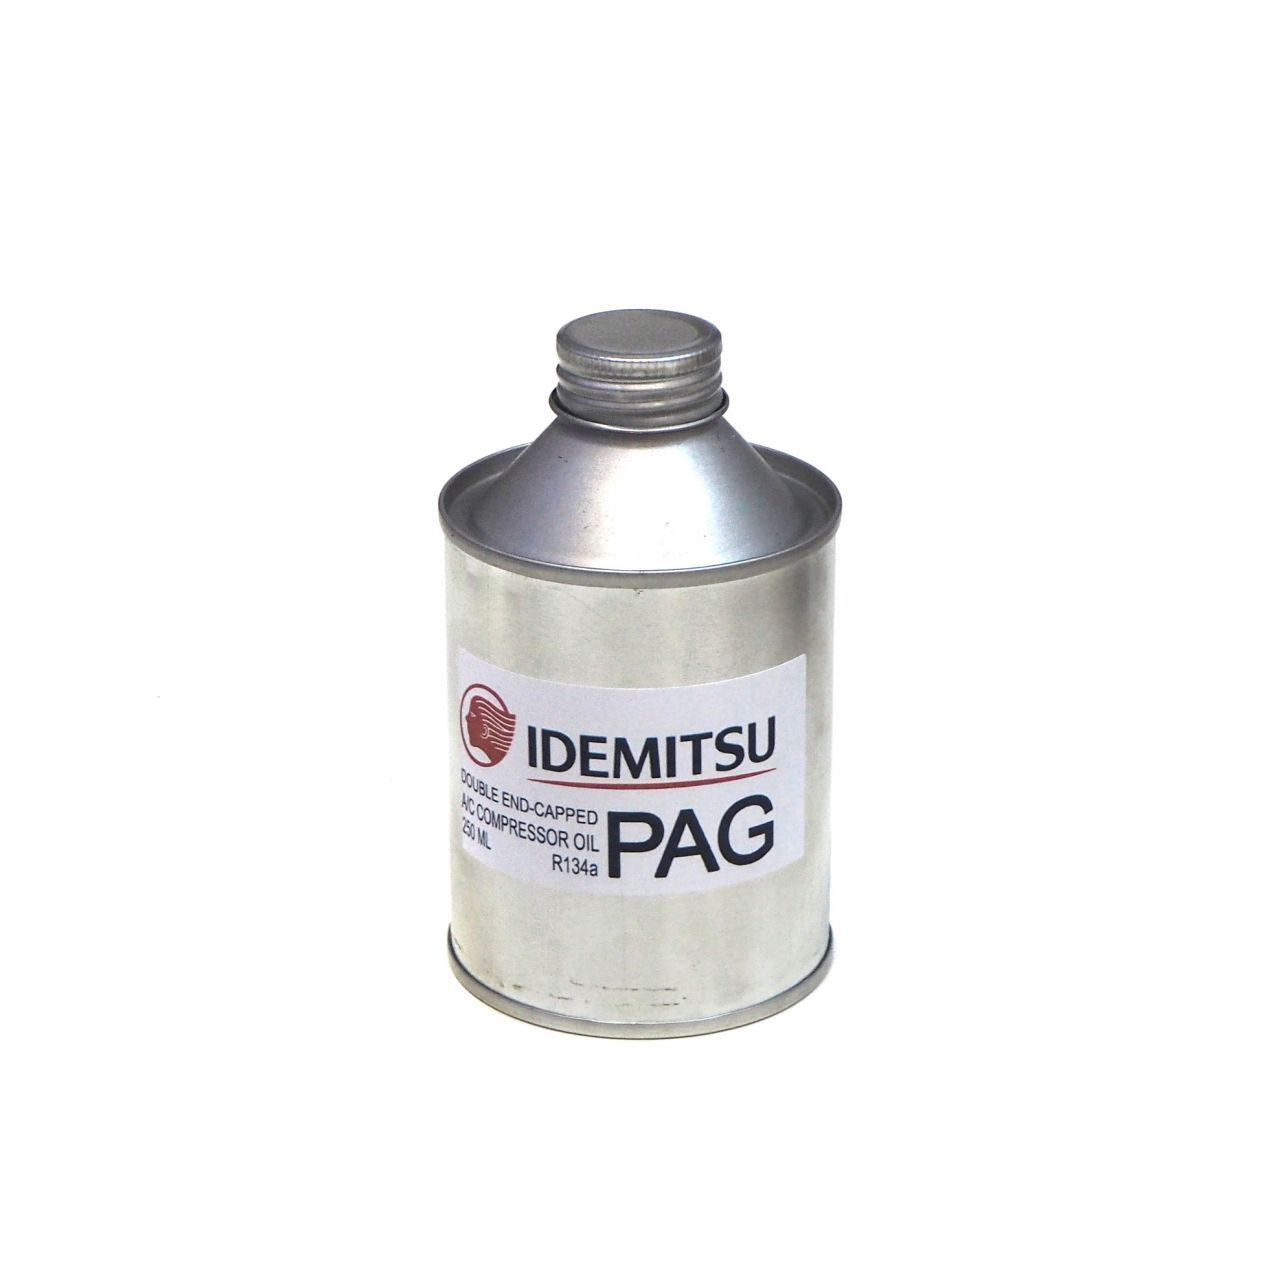 Масло компрессорное IDEMITSU daphne hermetic oil FD46XG 0,25 л - 1 000 руб.